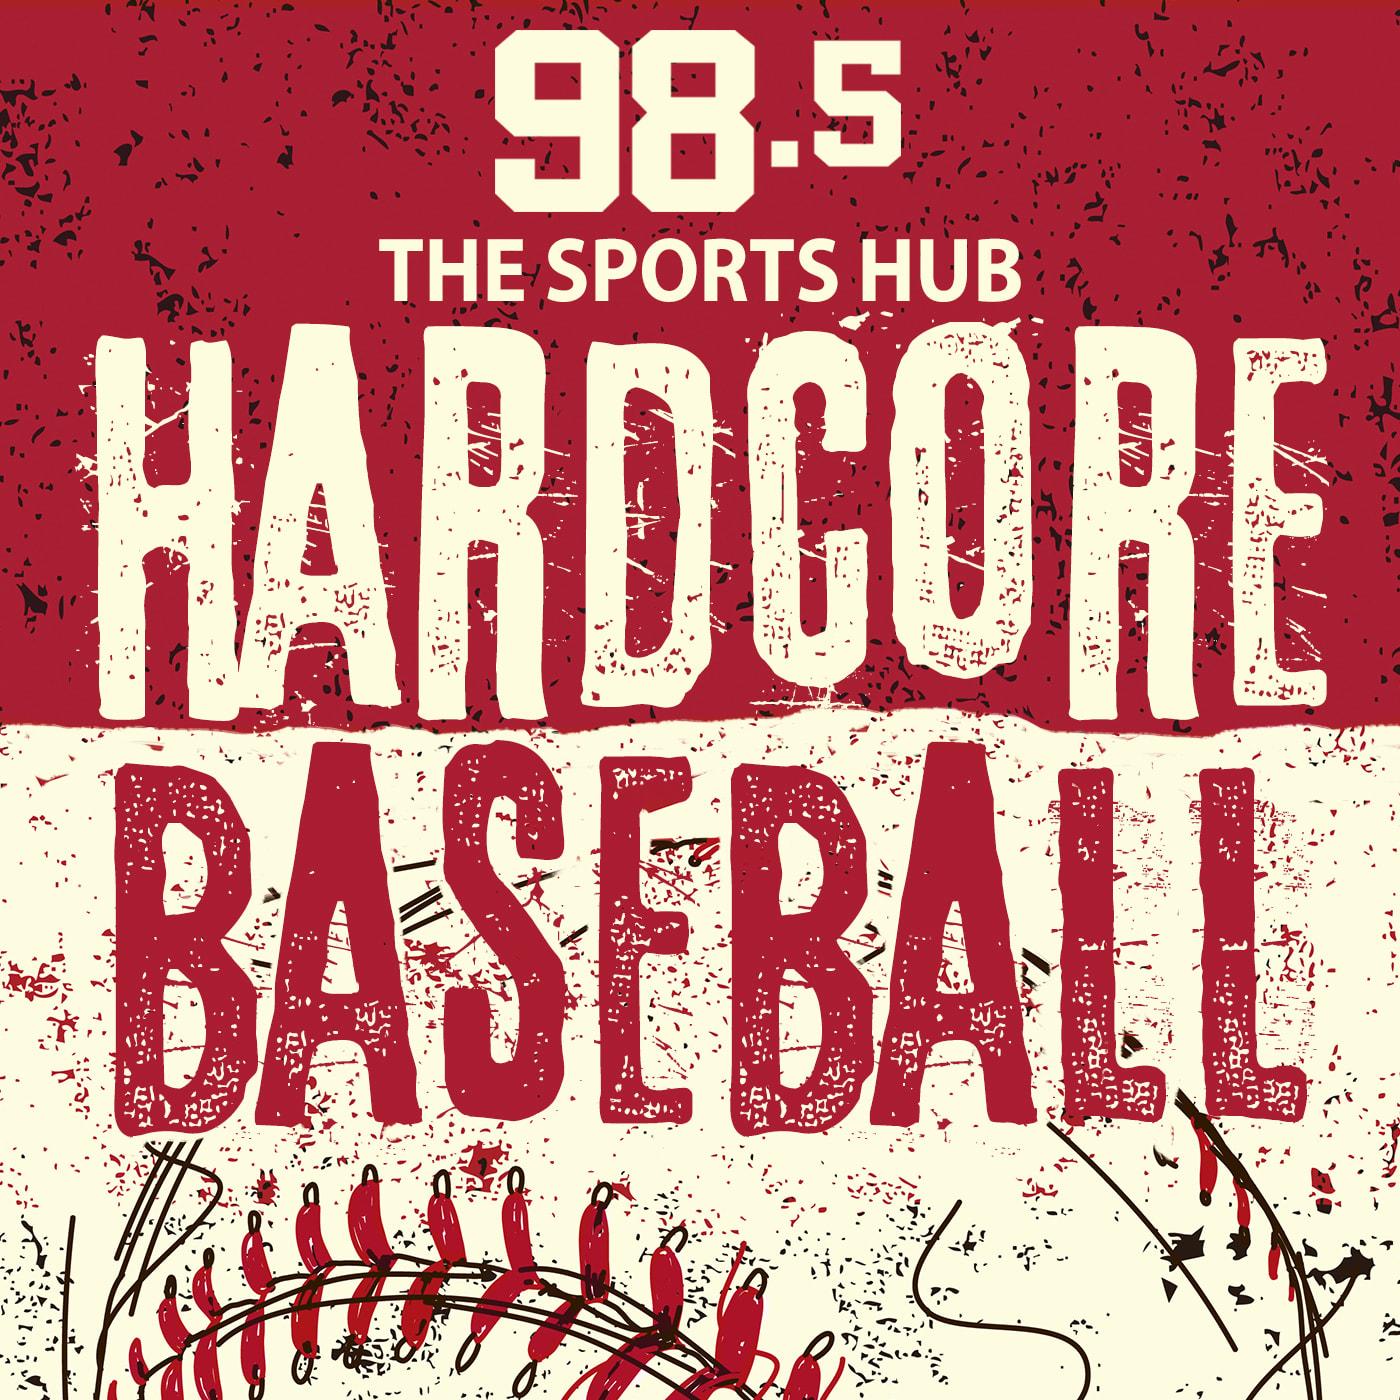 Hardcore Baseball: Sean McAdam, RoboUmps, Red Sox bullpen